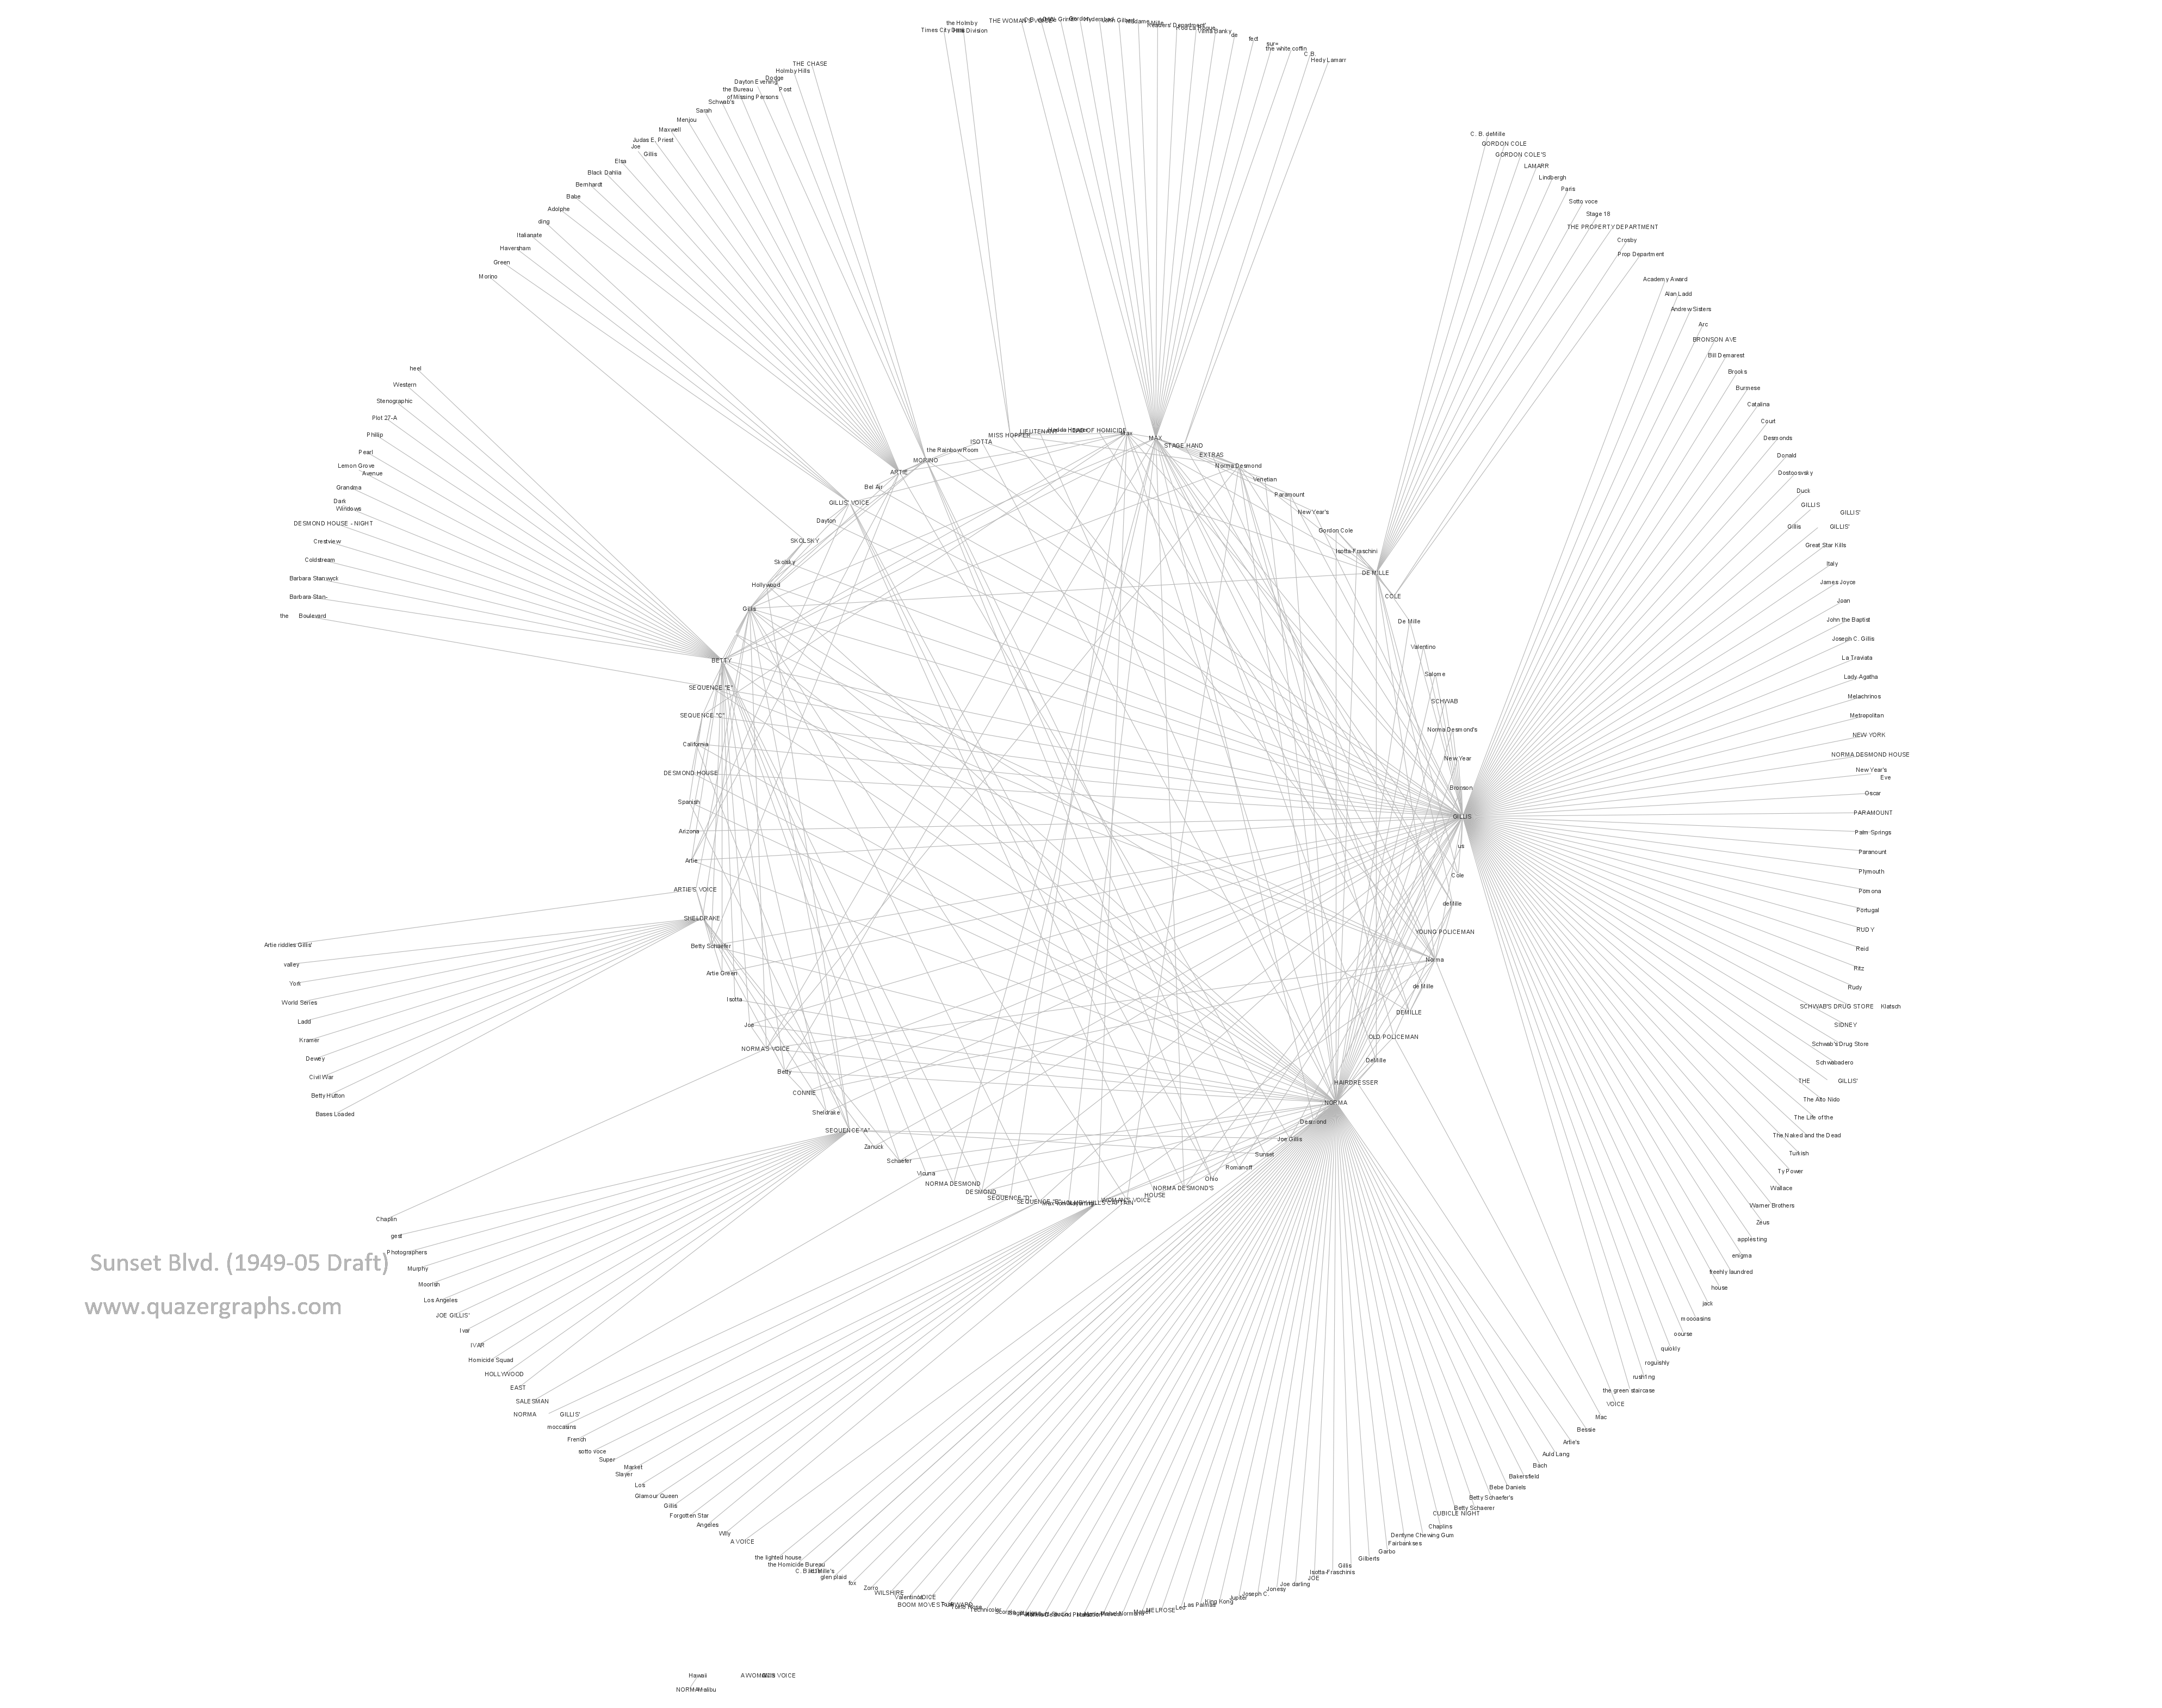 Sunset Blvd. (1949-05 Draft)